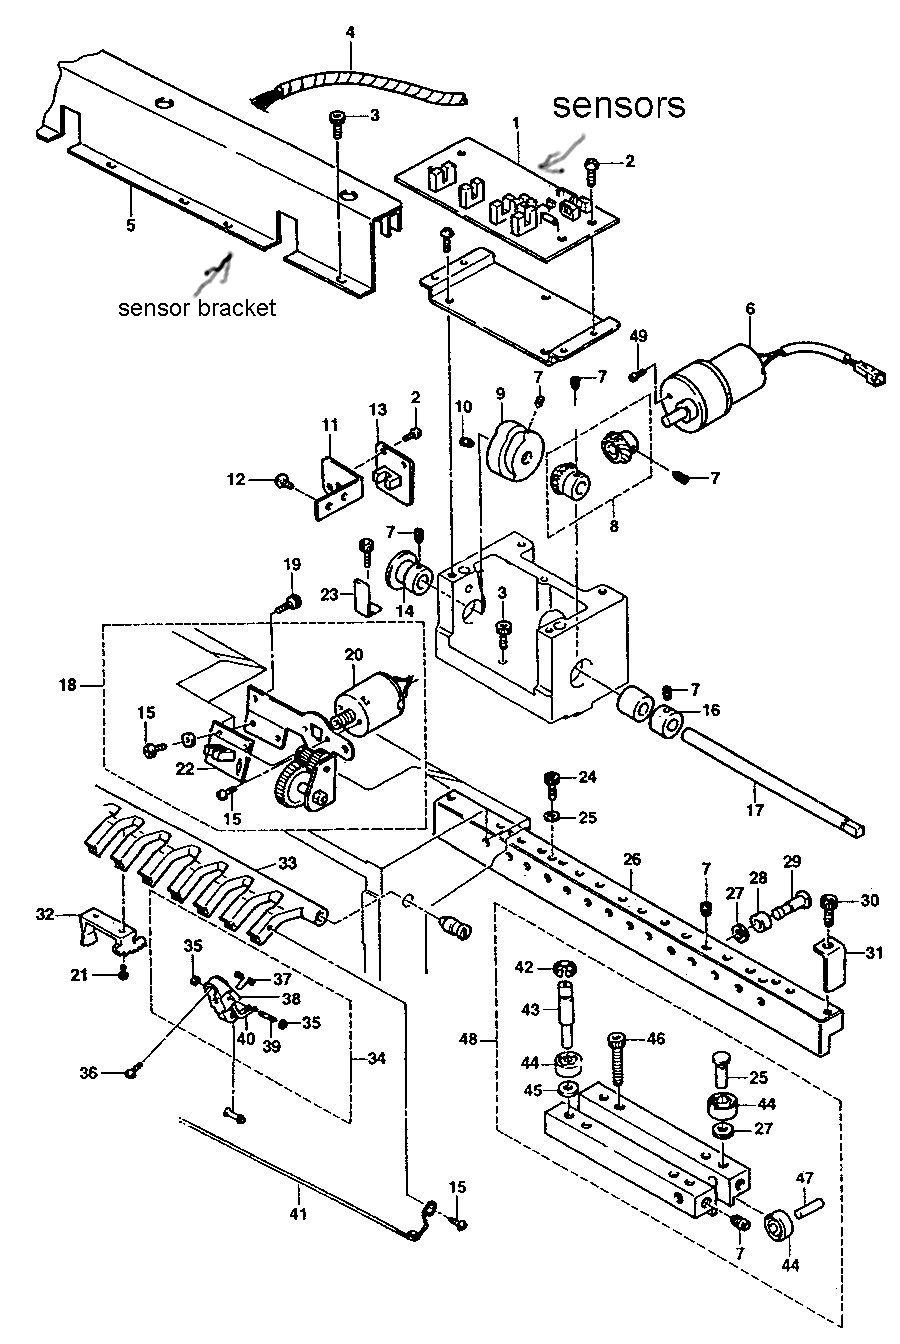 5 2 motor diagram auto electrical wiring diagram 2000 Isuzu Rodeo Engine Diagram toyota 850 needle change error